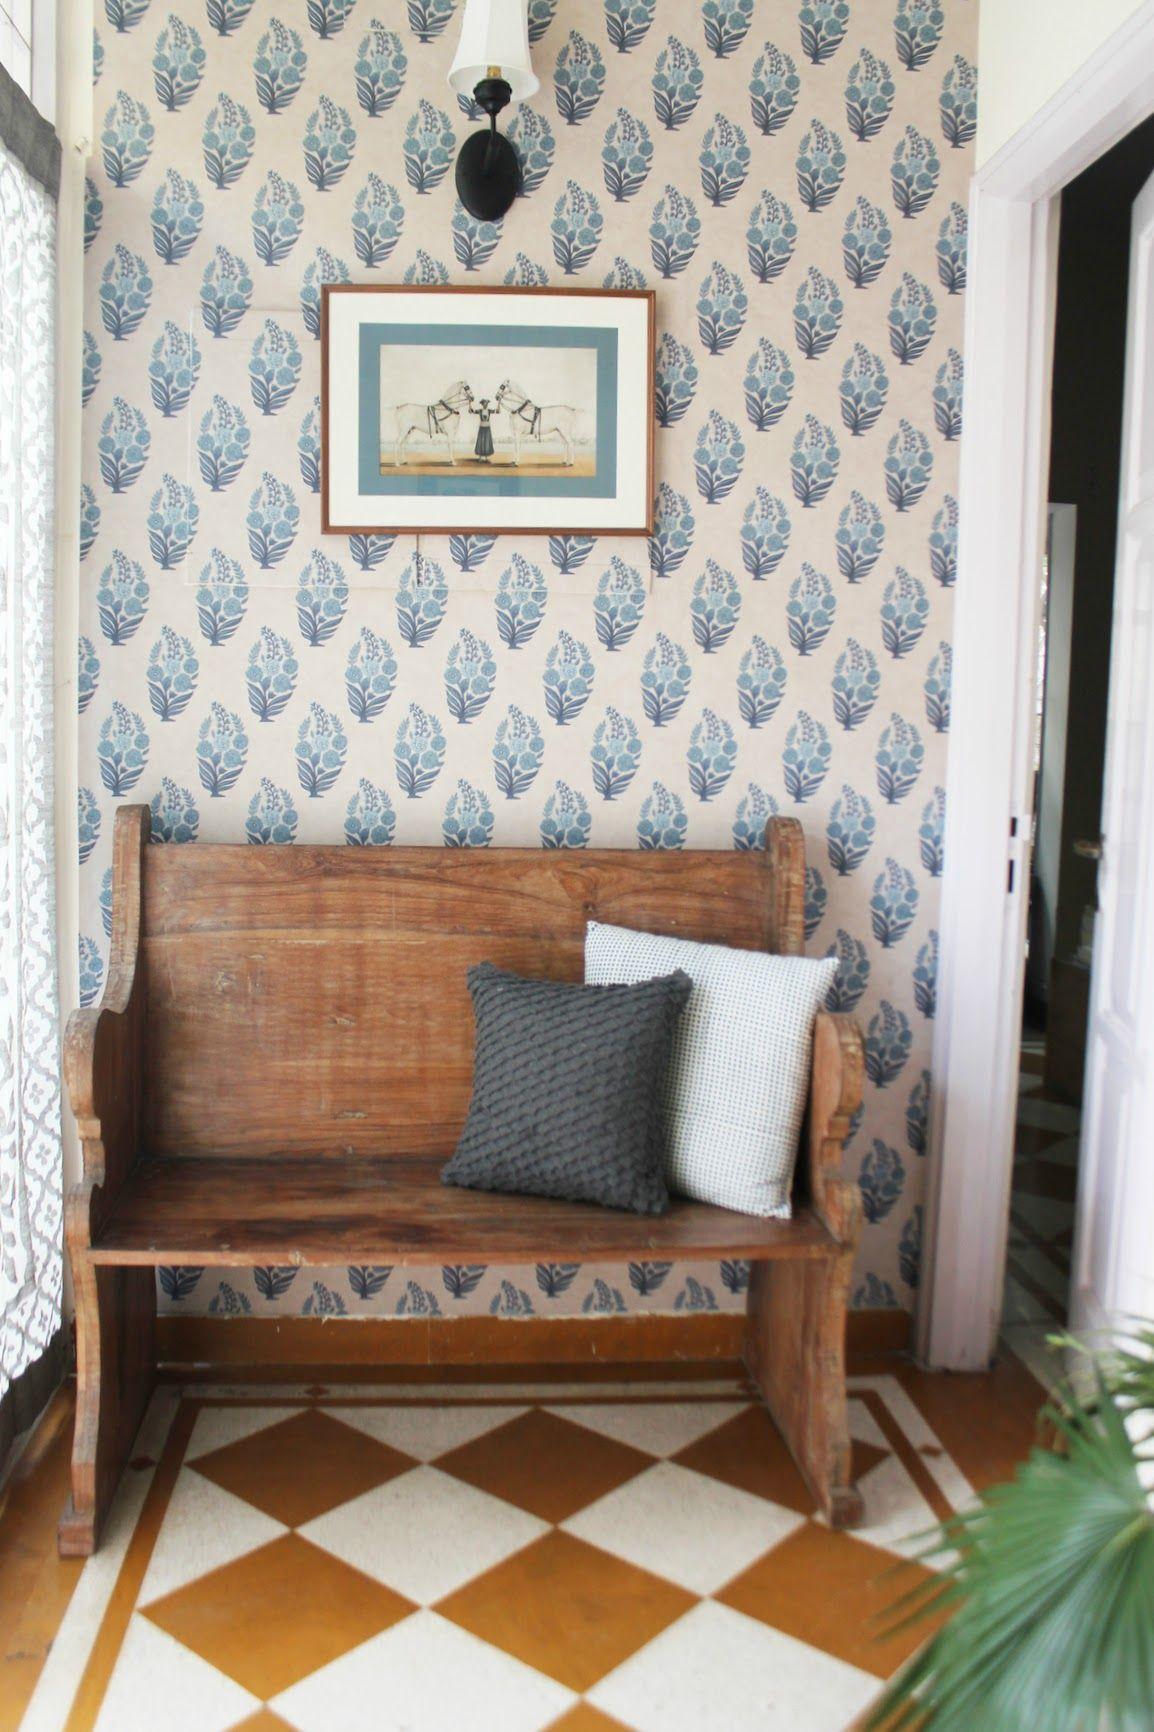 Wohnzimmer des modernen interieurs des hauses in new delhi a calming oasis for two journalists  wohnen